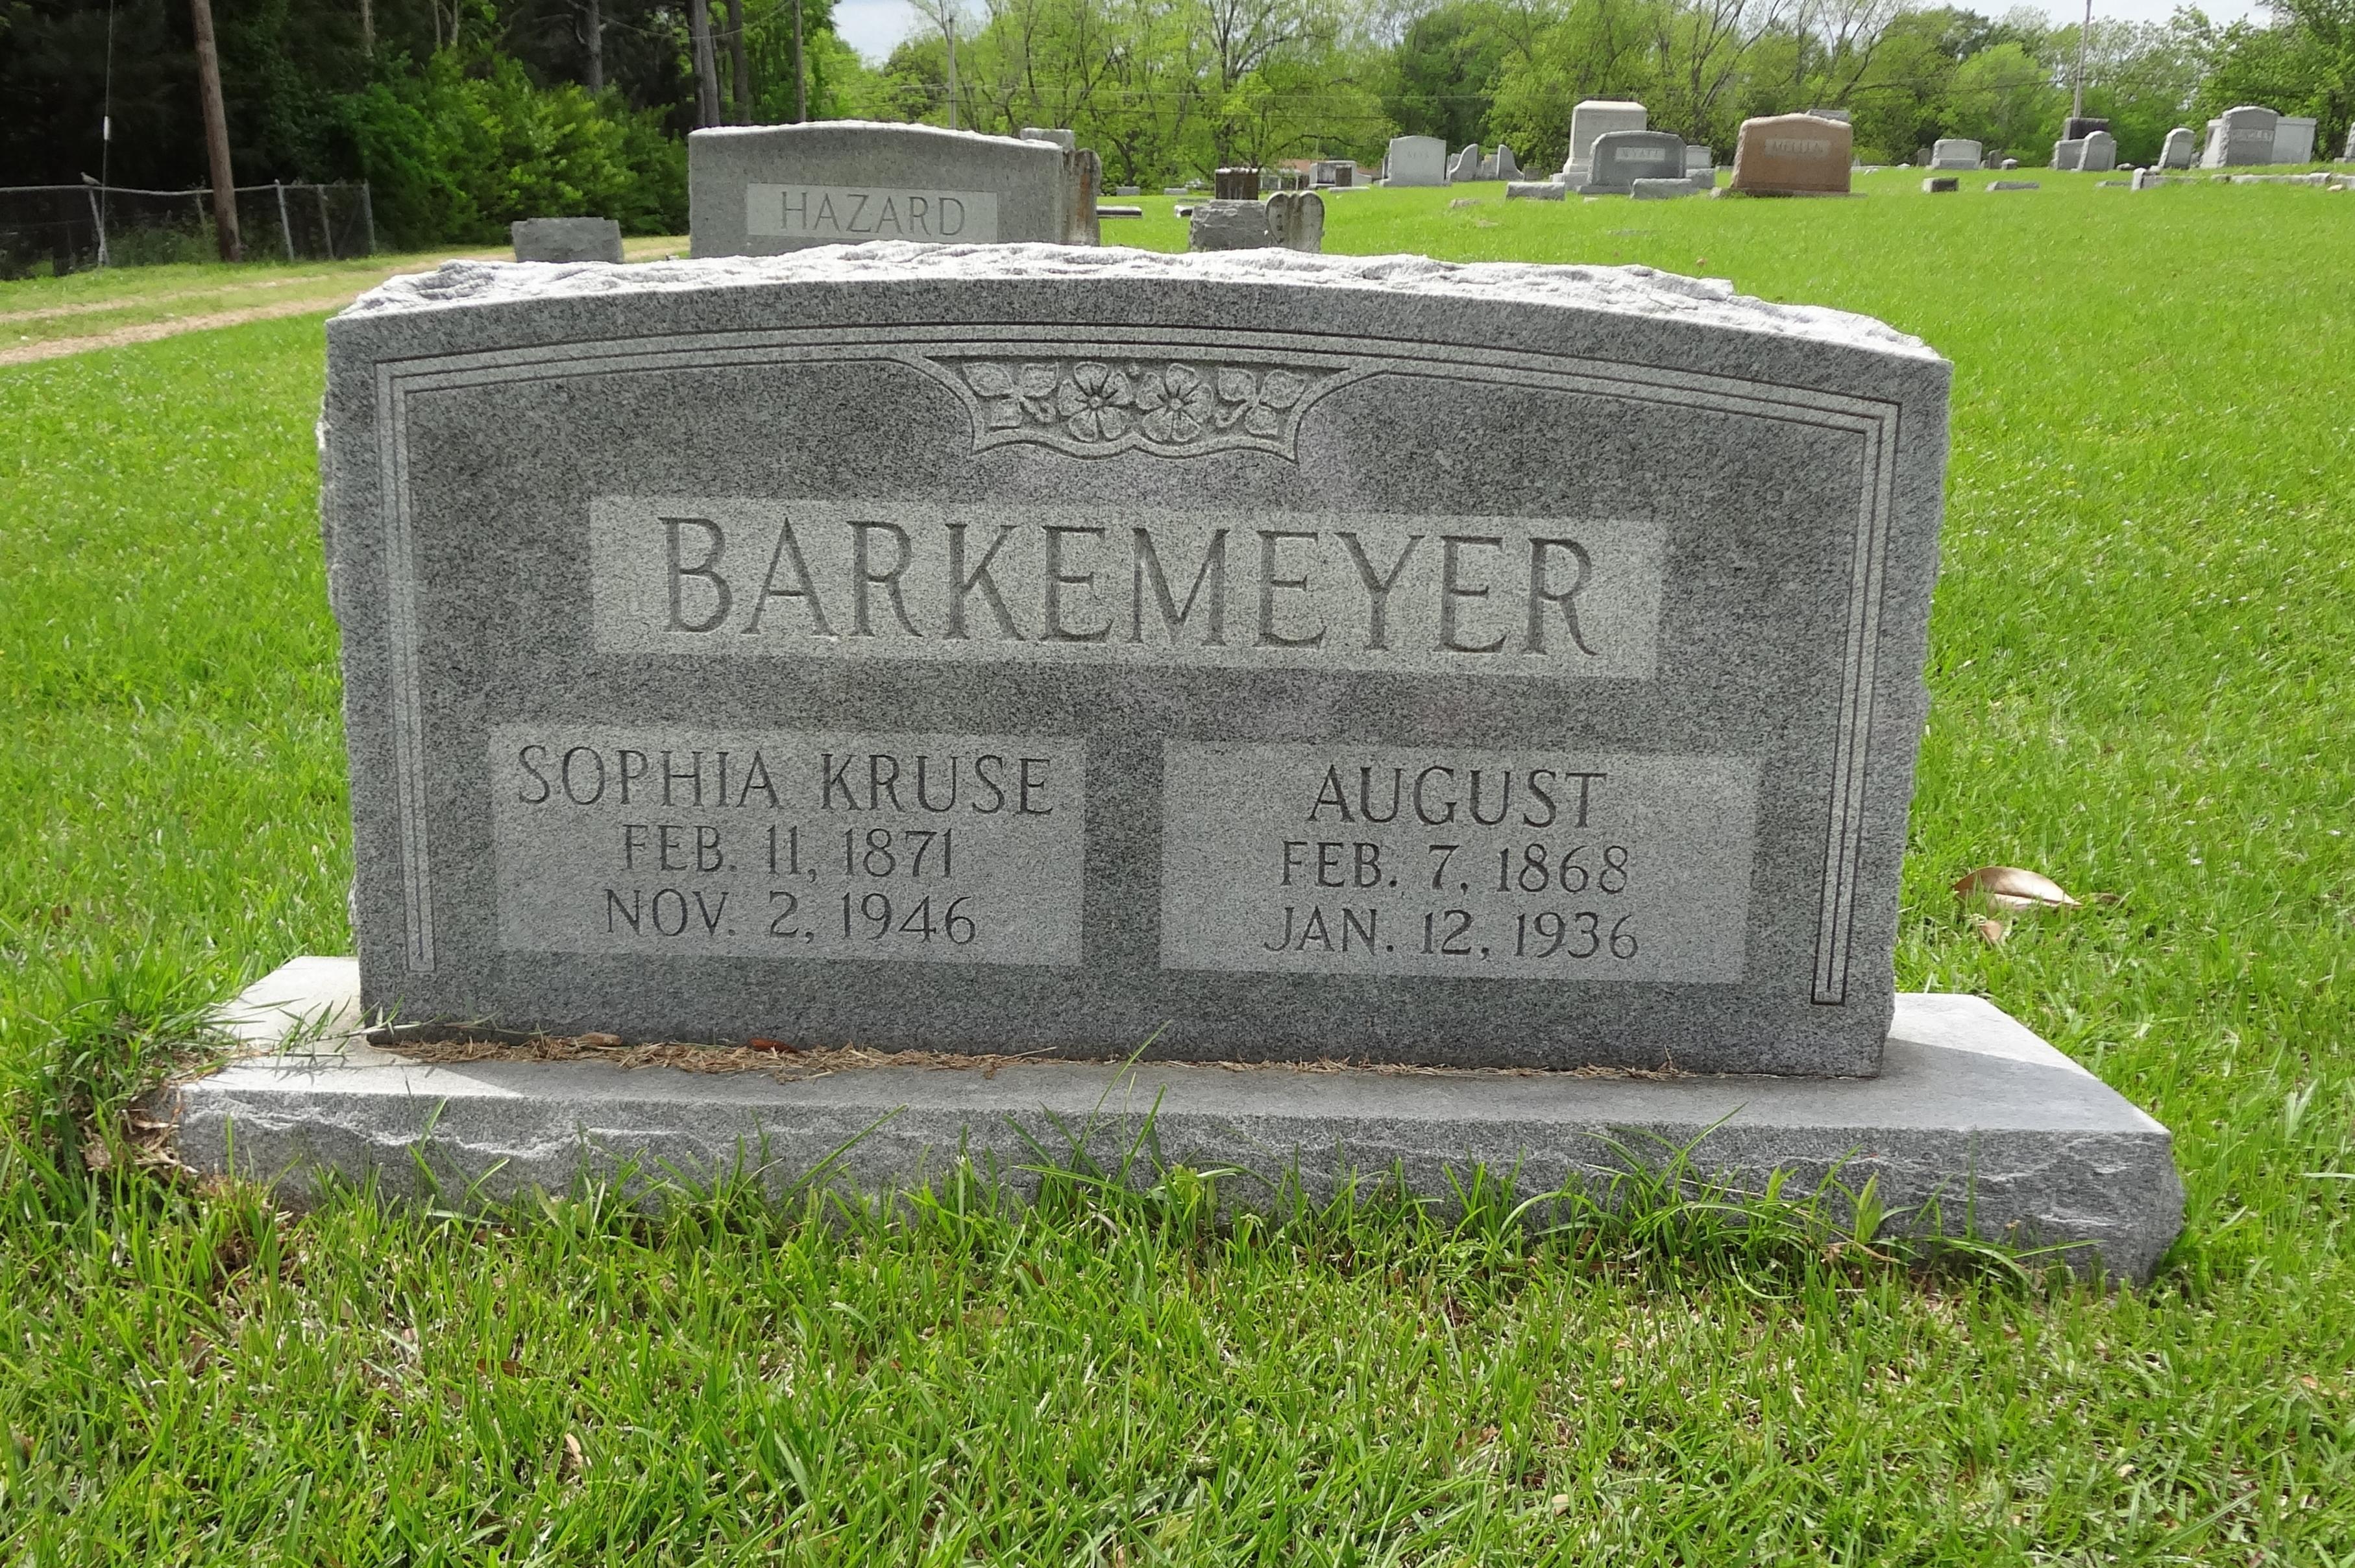 August Barkemeyer